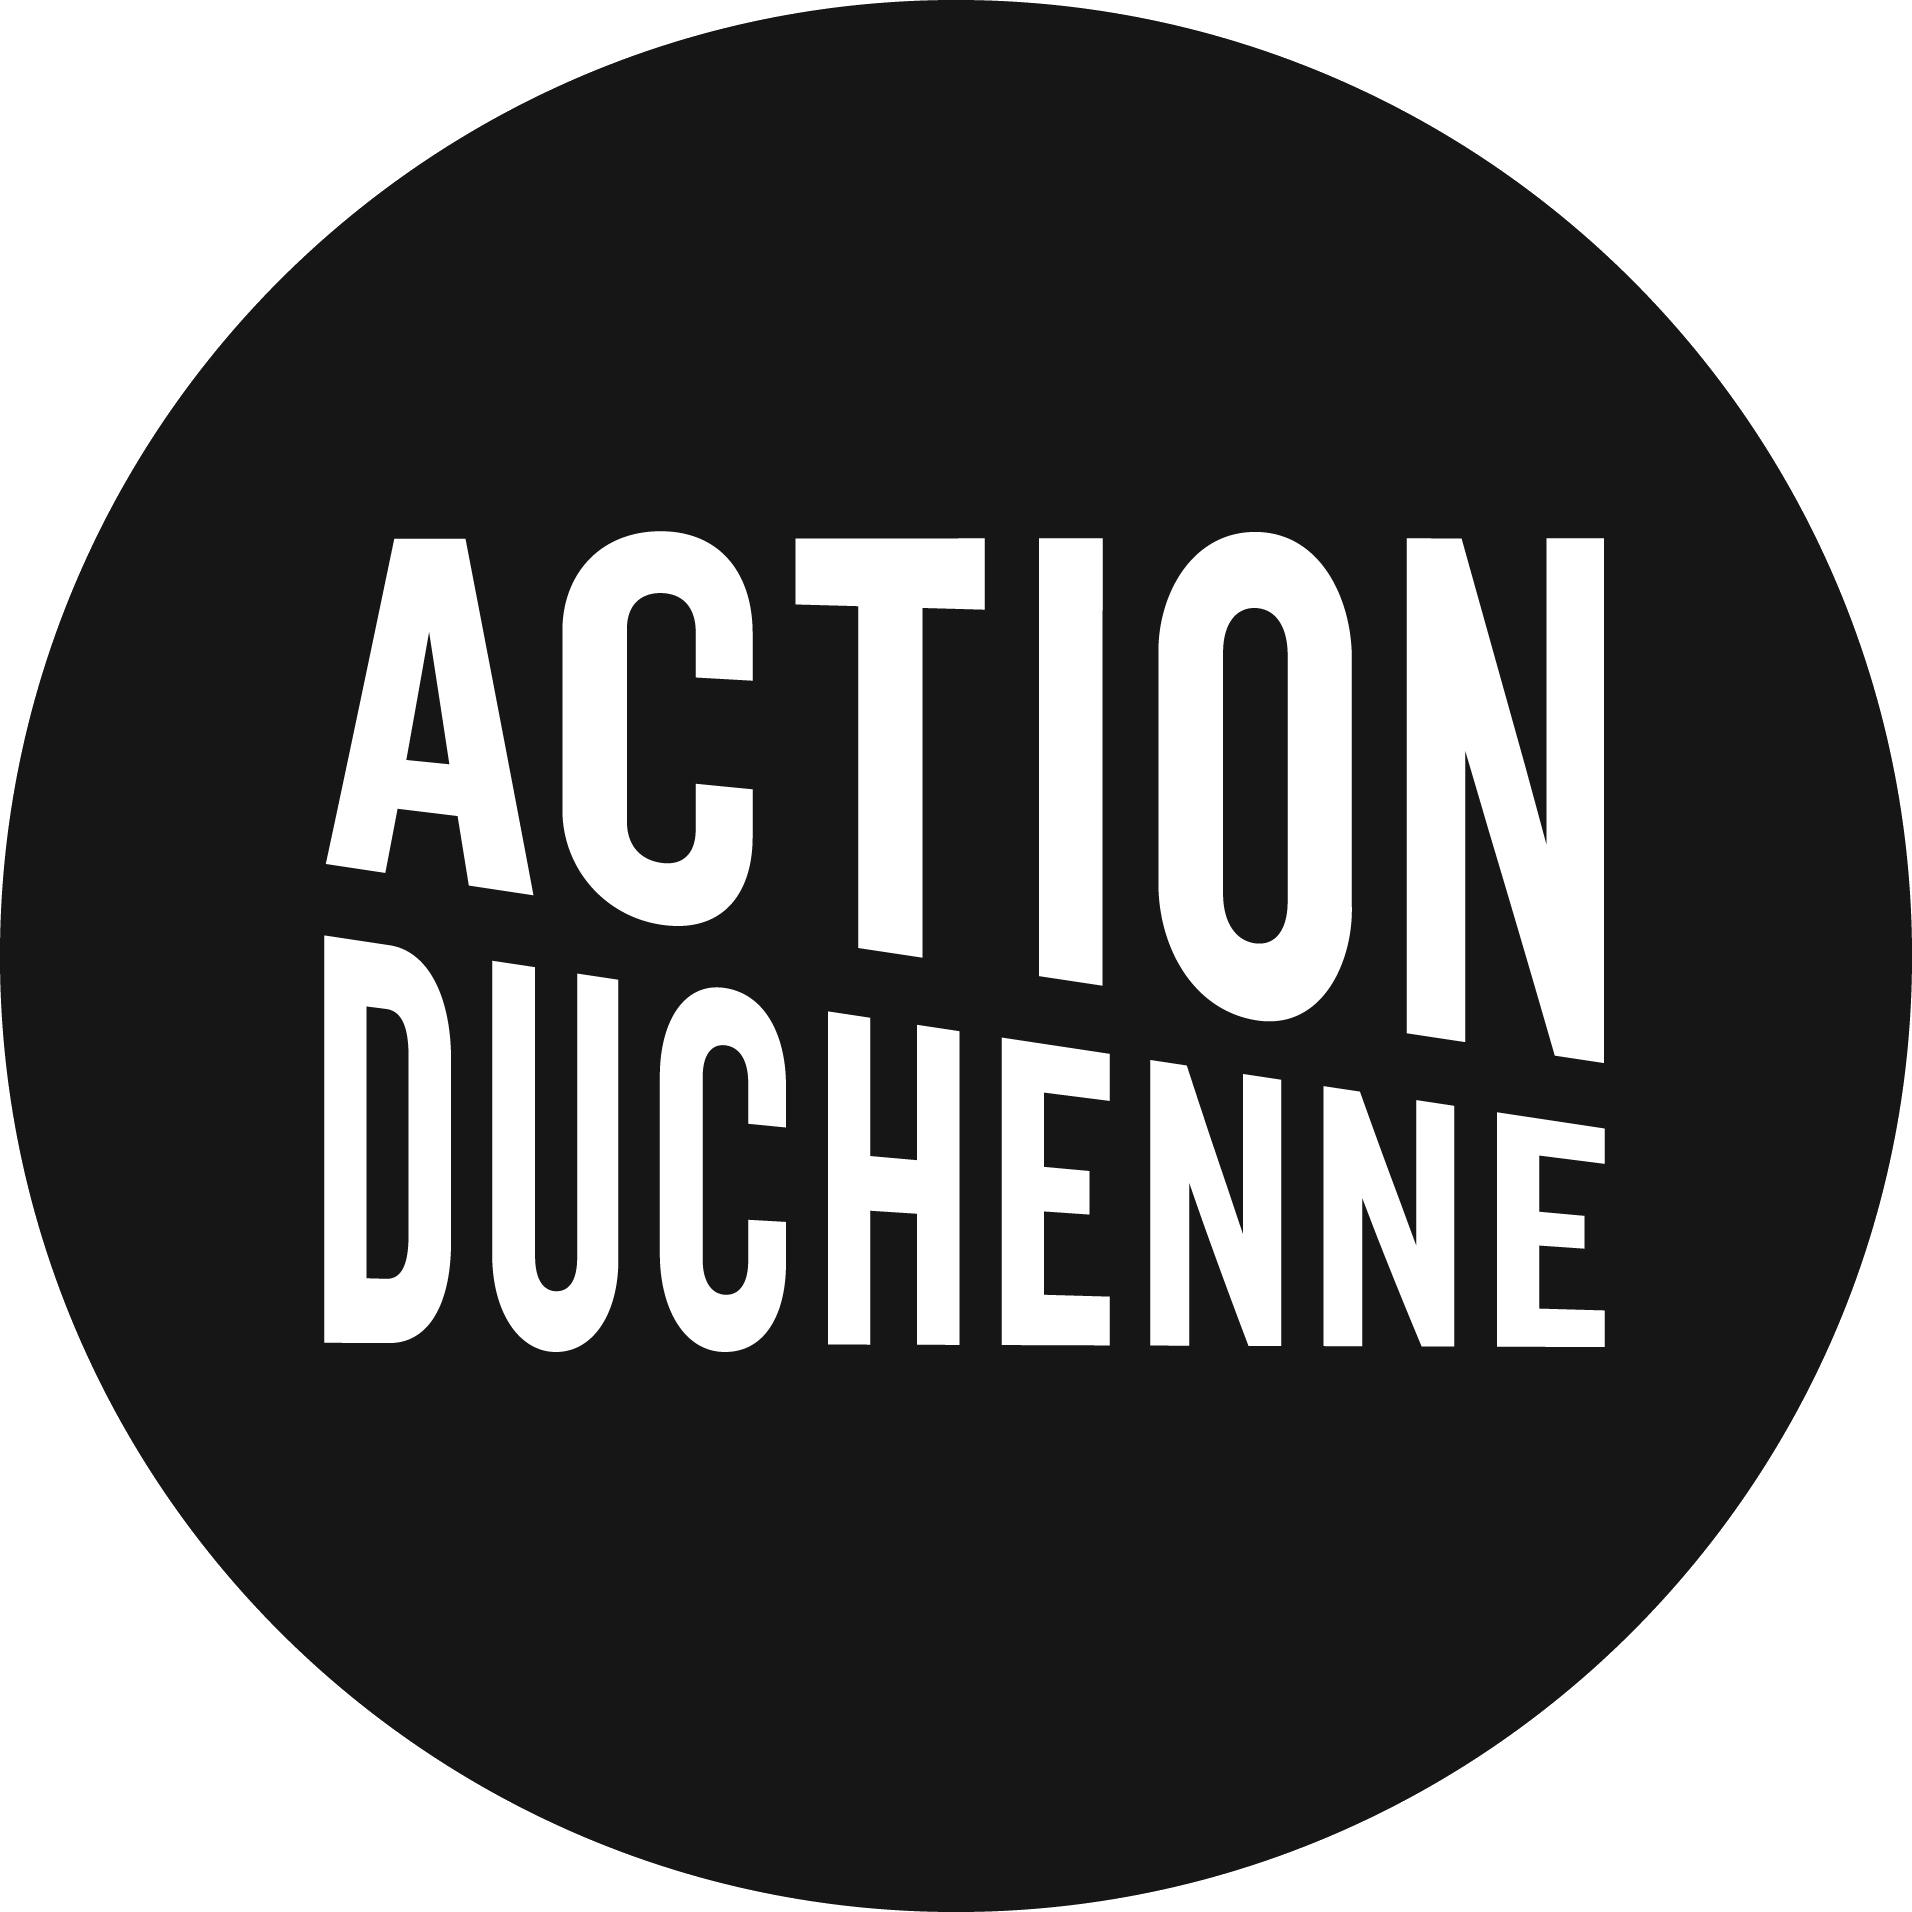 From: https://councilfordisabledchildren.org.uk/sites/default/files/field/image/action%20duchenne.jpg Action Duchenne video